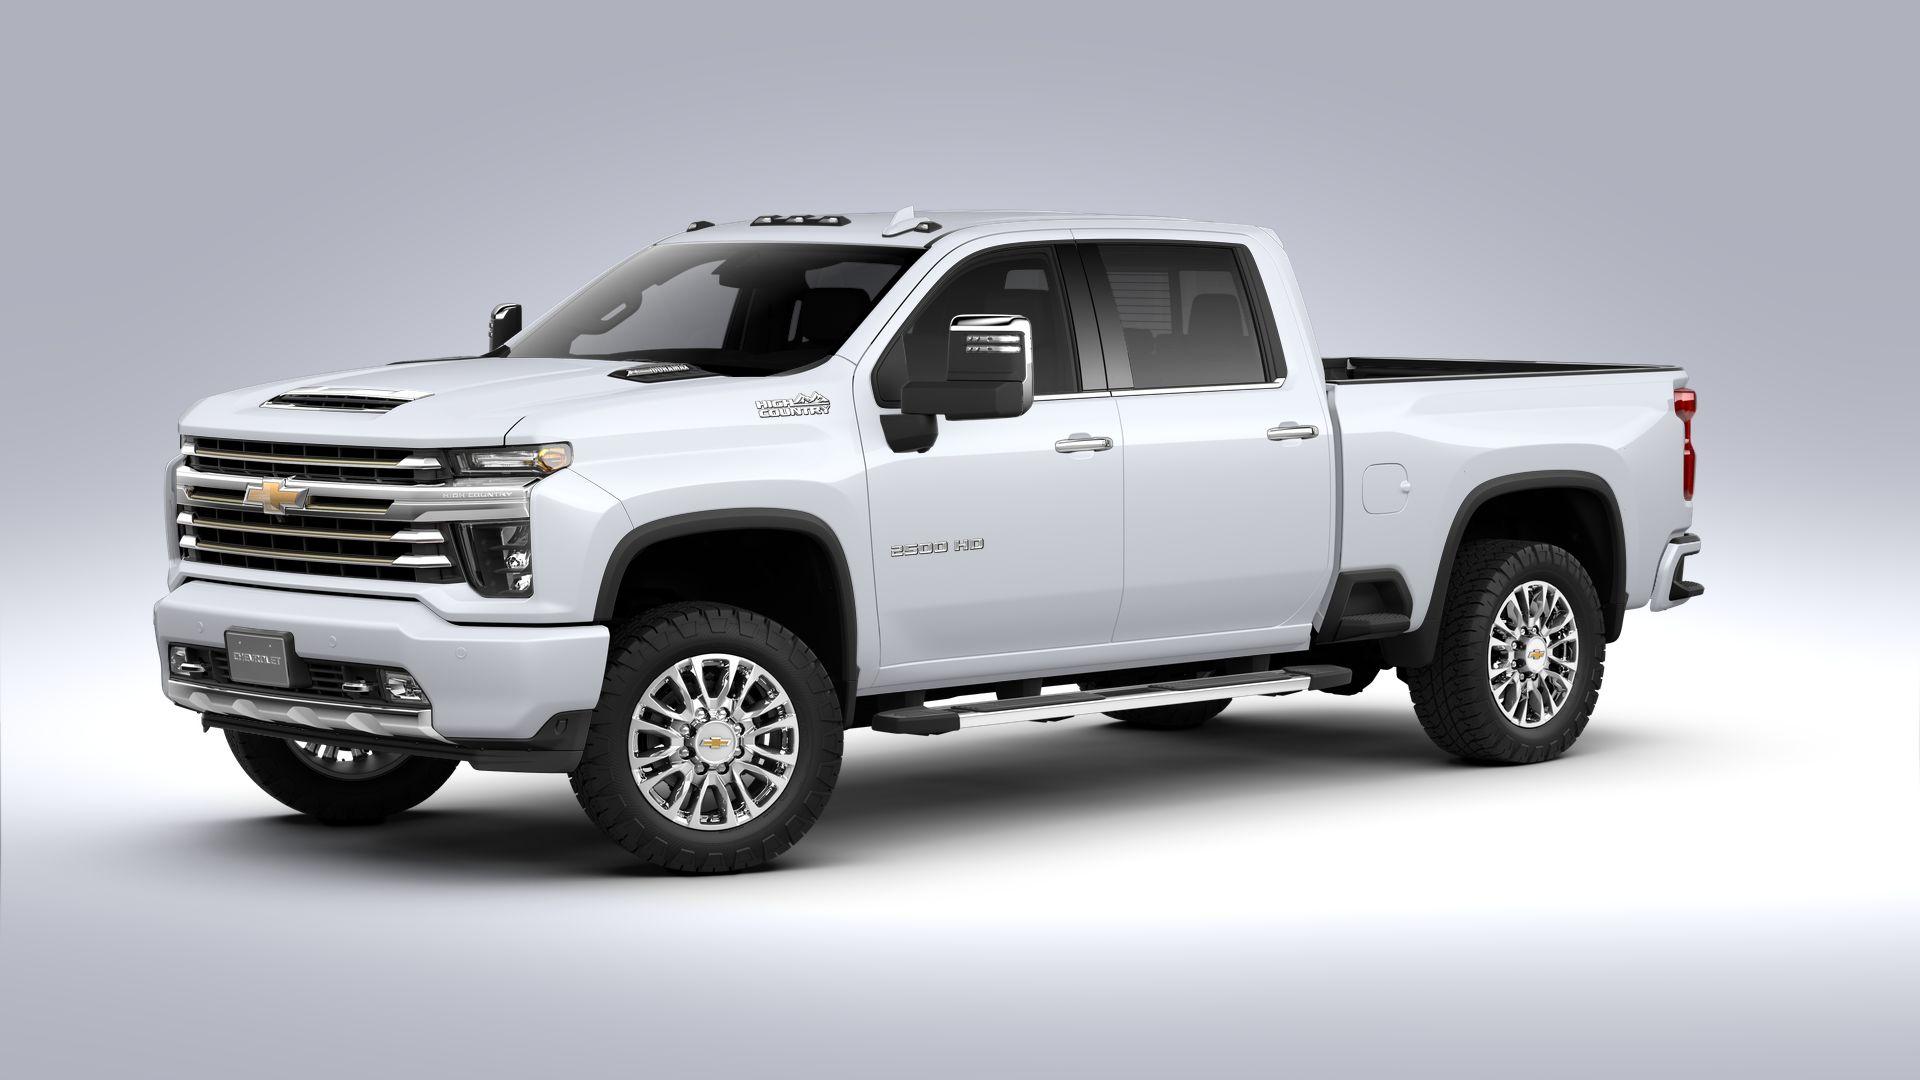 2021 Chevrolet Silverado 2500 HD High Country